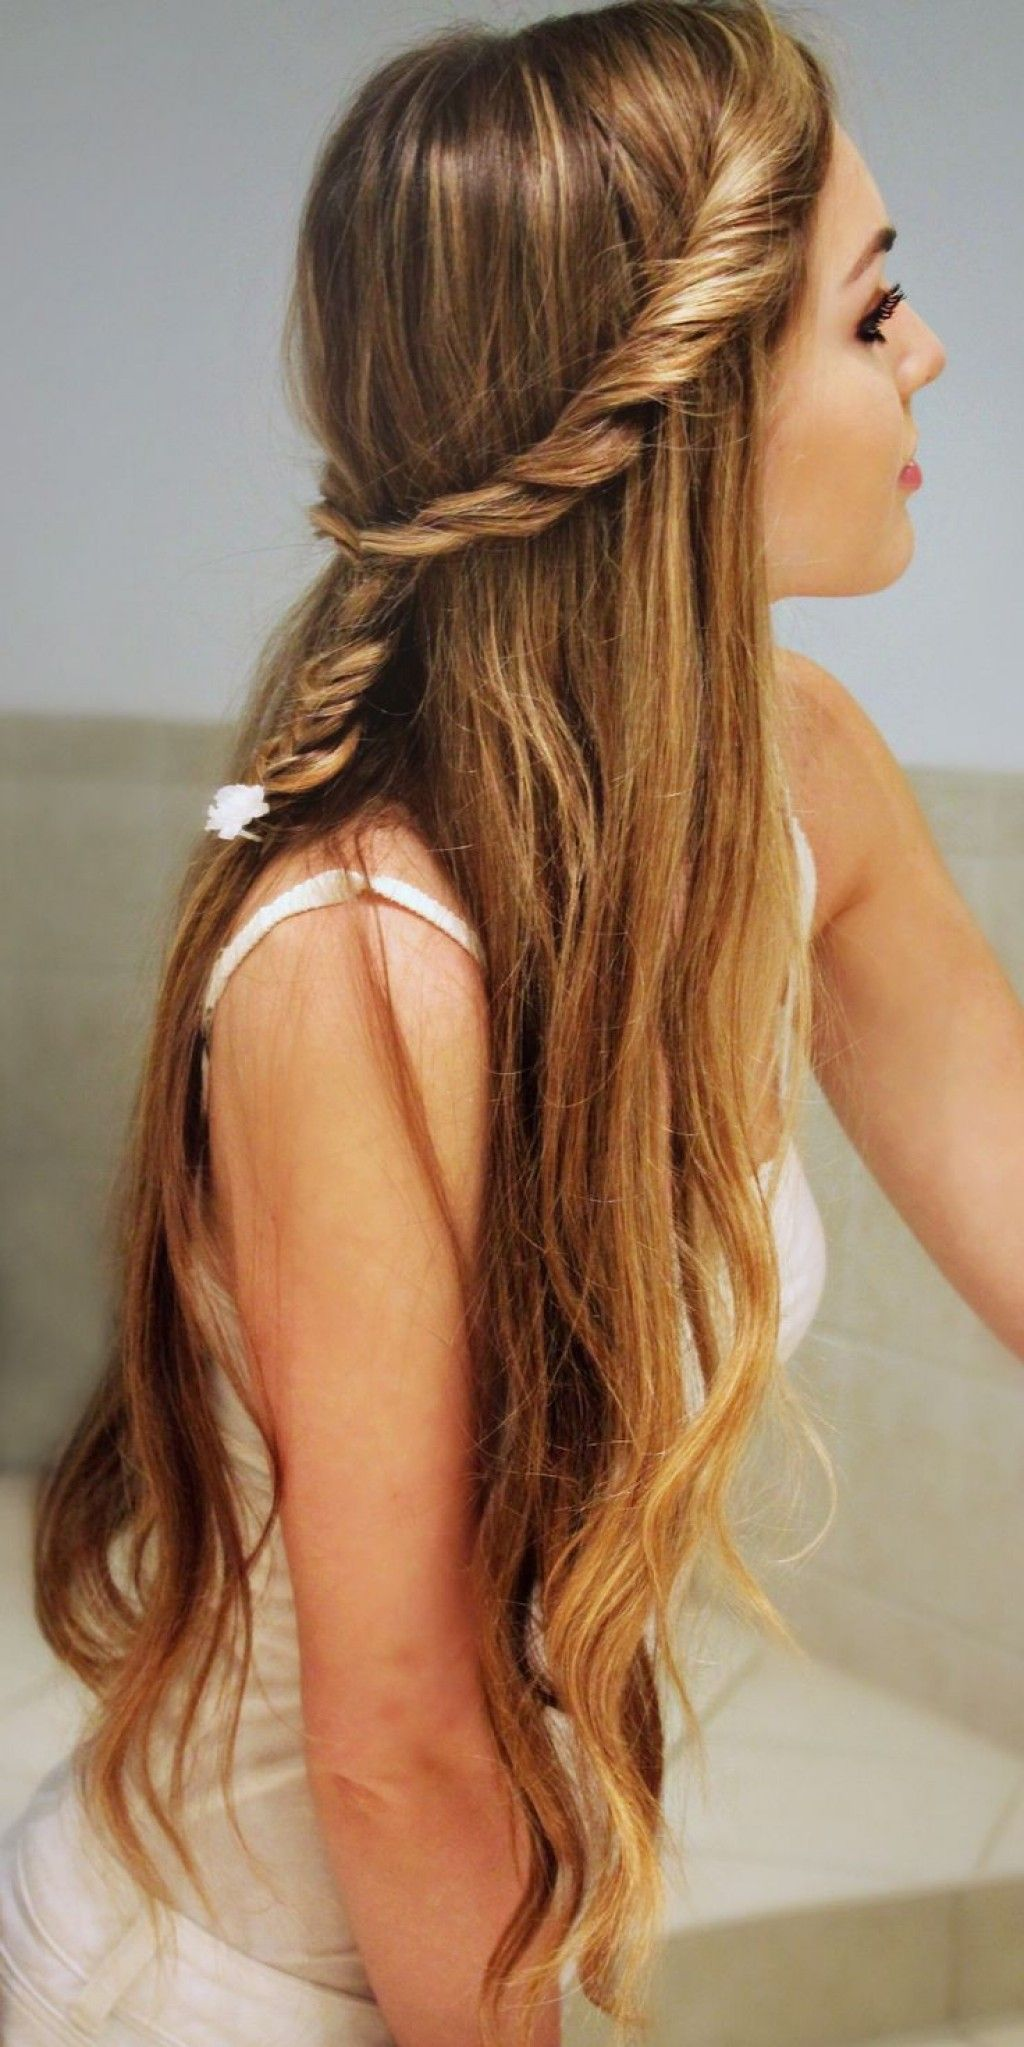 Cute backtoschool hairstyles for girls school hairstyles school